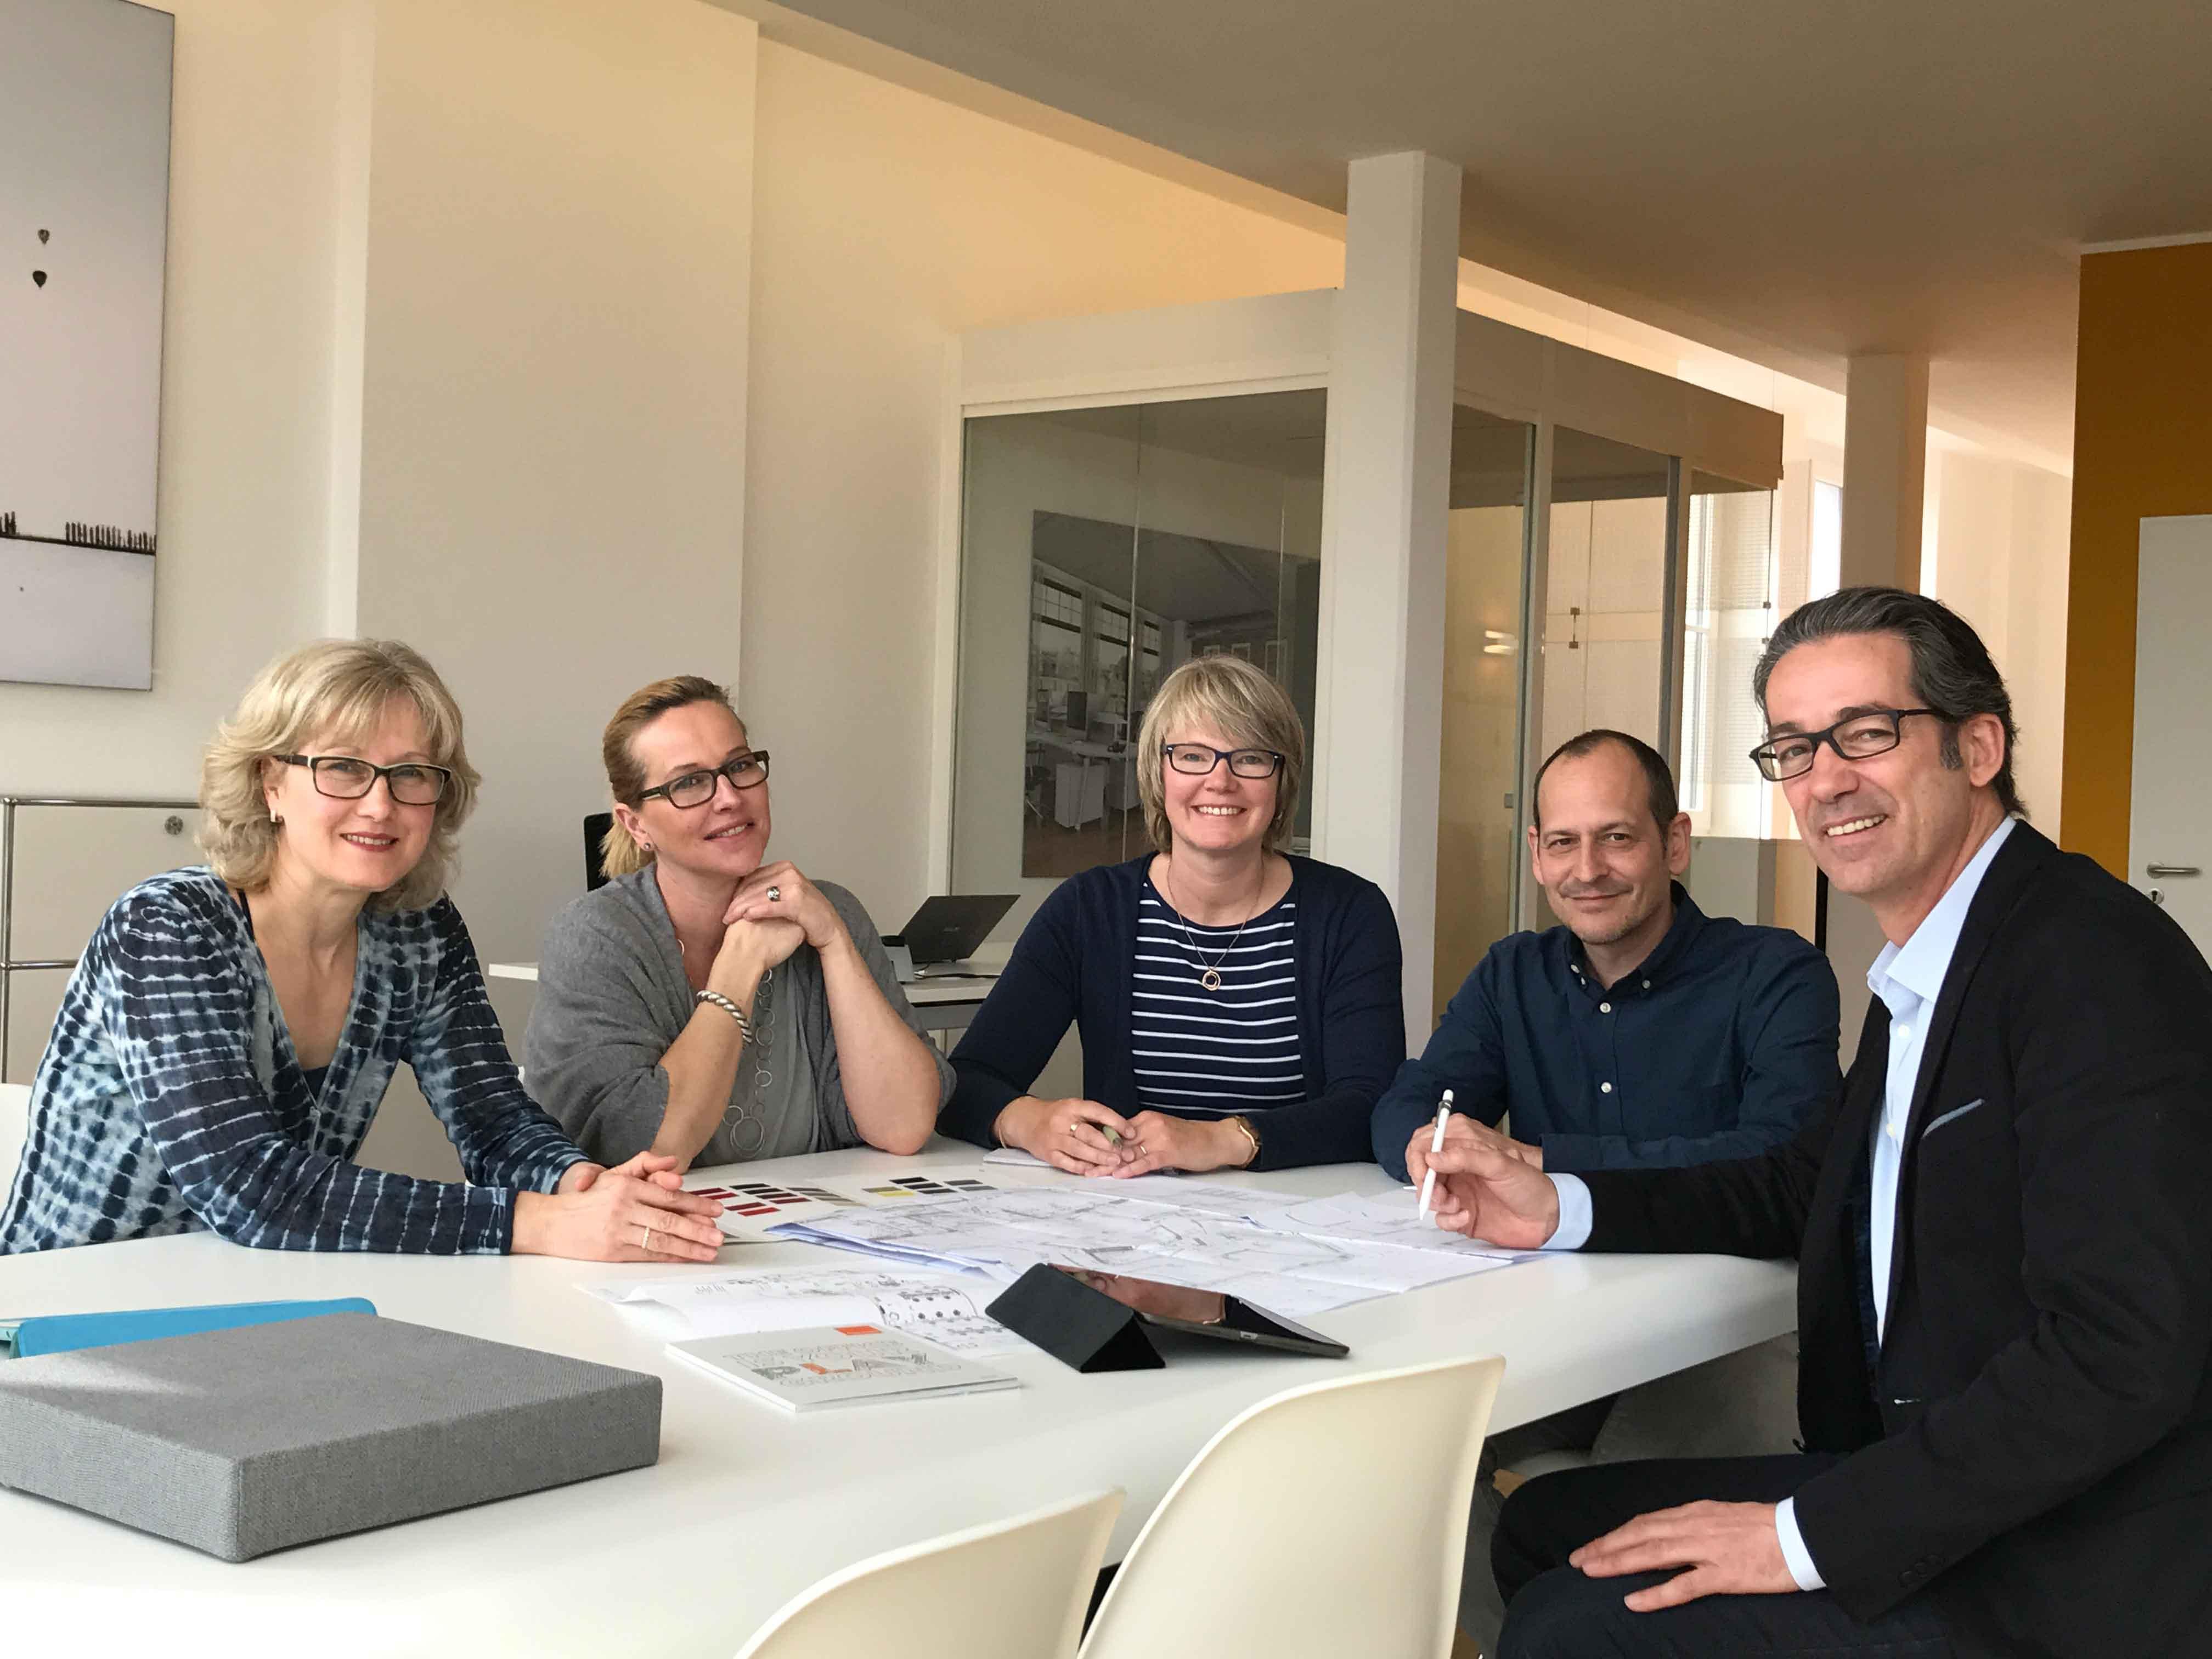 Team objectiv Köln arbeitet mit WISO Mein Büro